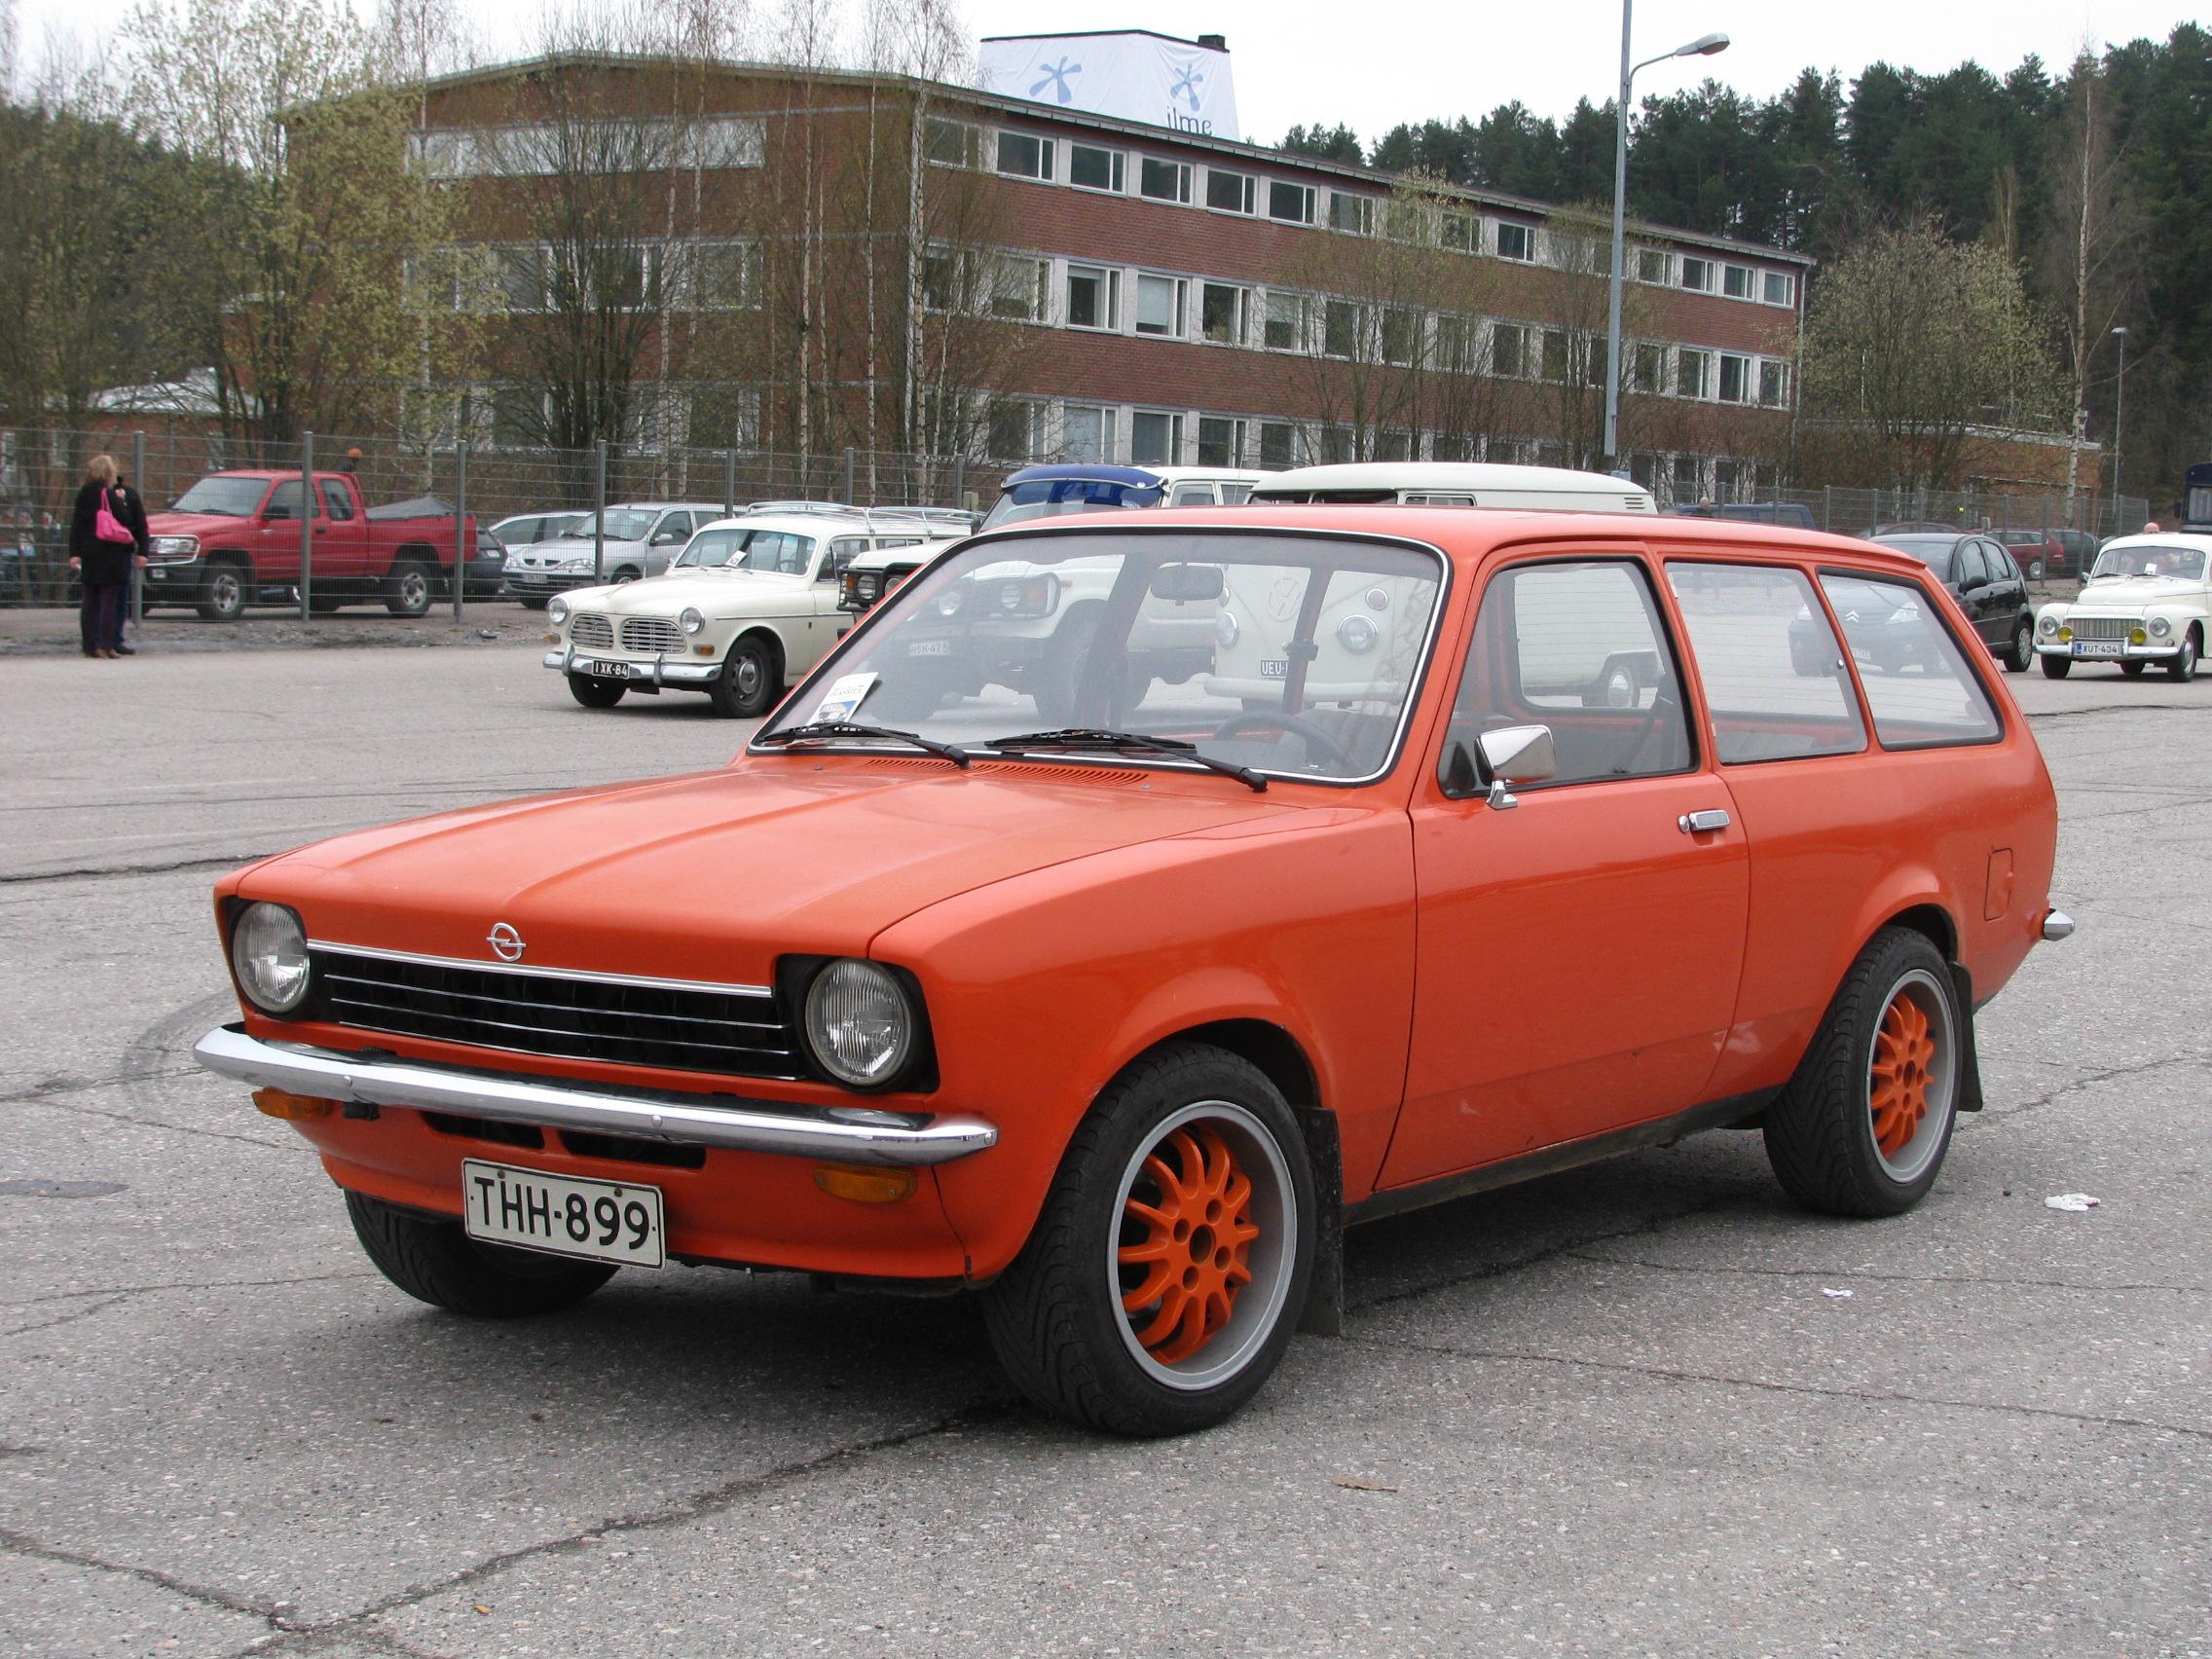 http://upload.wikimedia.org/wikipedia/commons/e/e4/Opel_Kadett_C_Kombi_Lahti.JPG